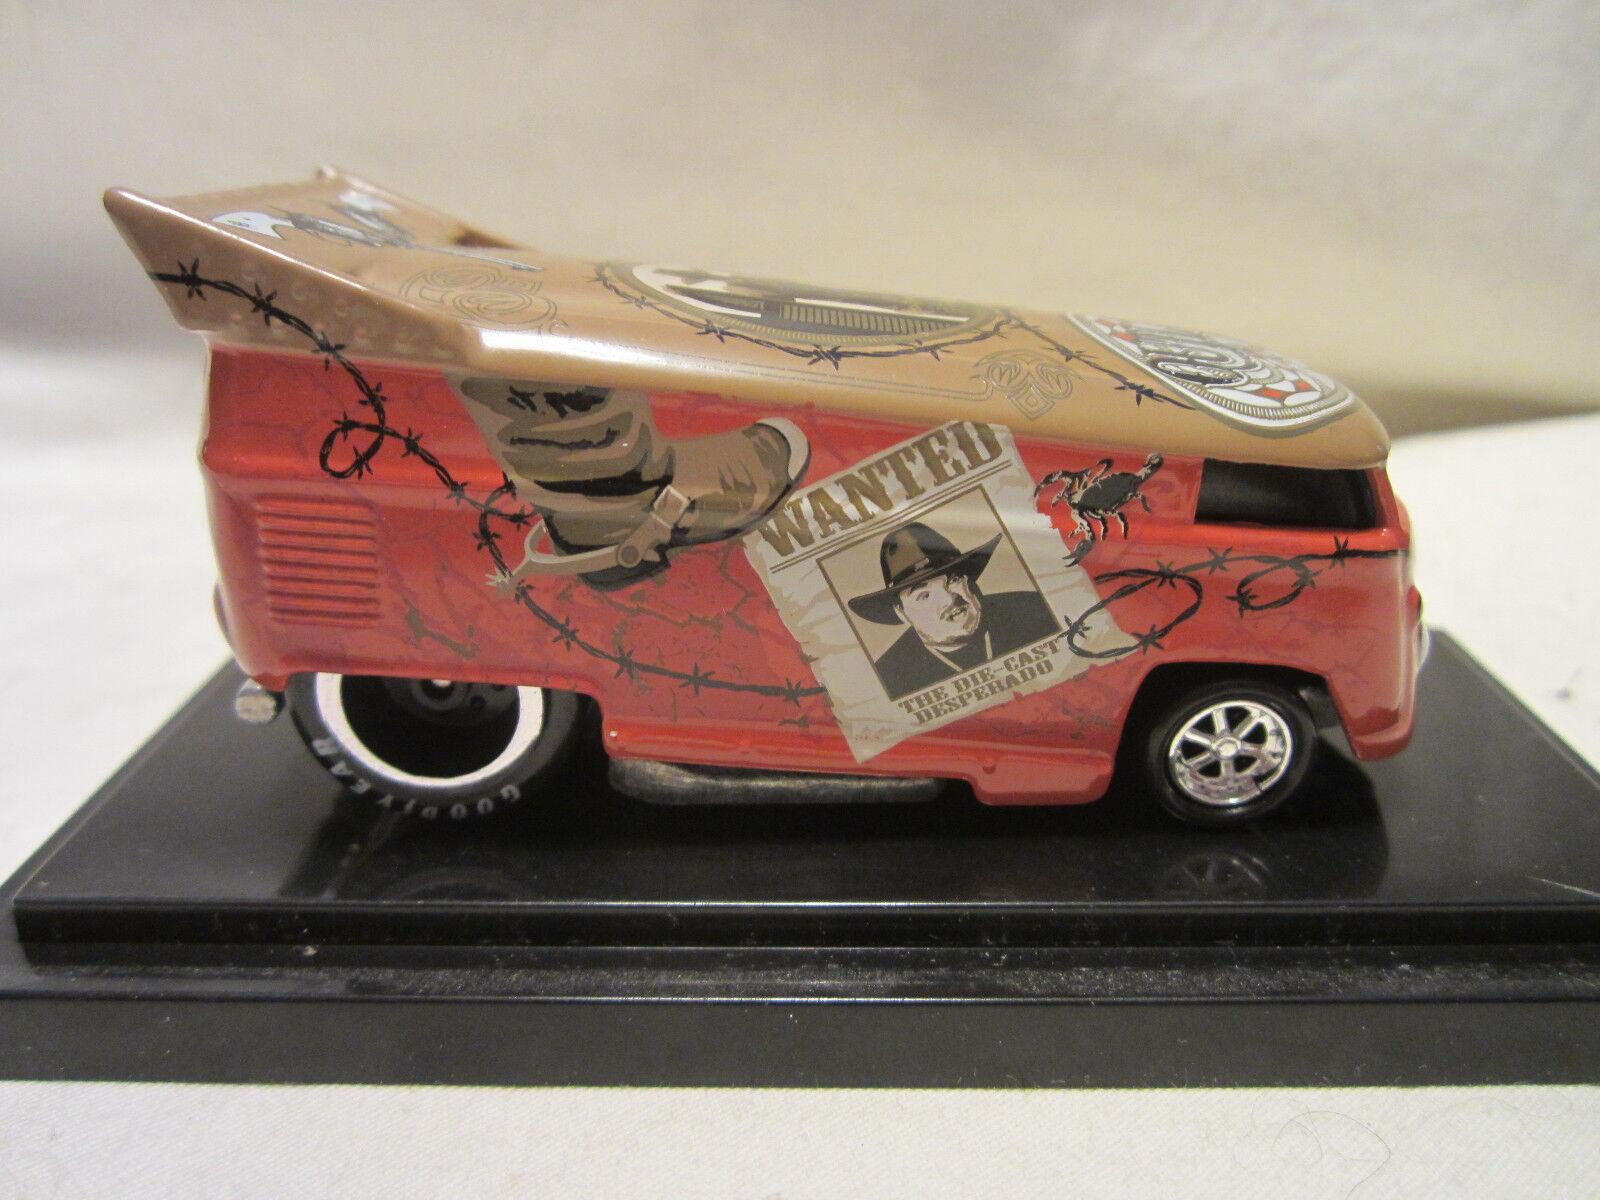 caliente ruedas Liberty Promotions Outlaw con Mug Scalientes VW DROG autobus;528 1000 fatto